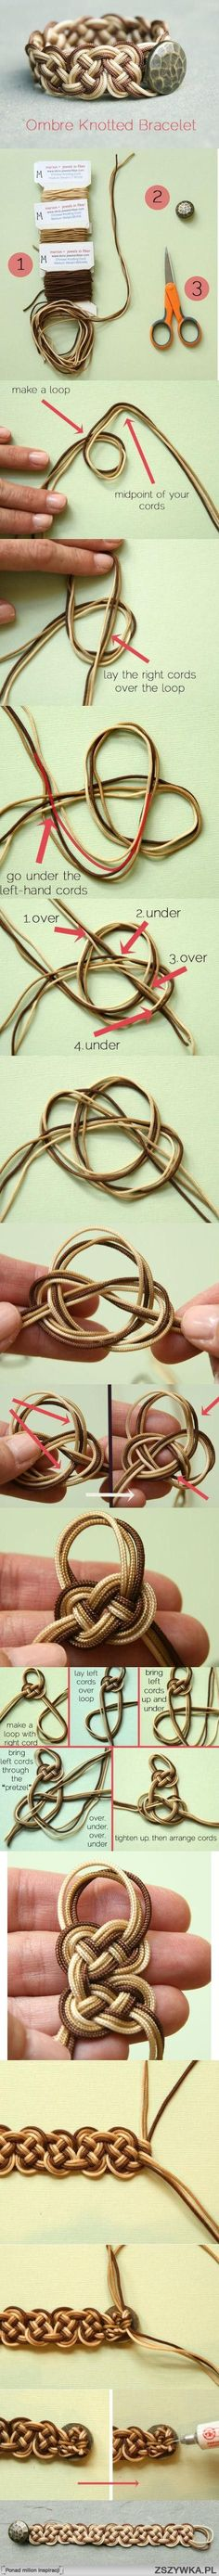 ombre celtic knot bracelet | How Do It  We should make this a cousin bracelet!! Represent our heritage! @Mandi @Kim @Graci @Tabetha @Caroline @Heather :0)